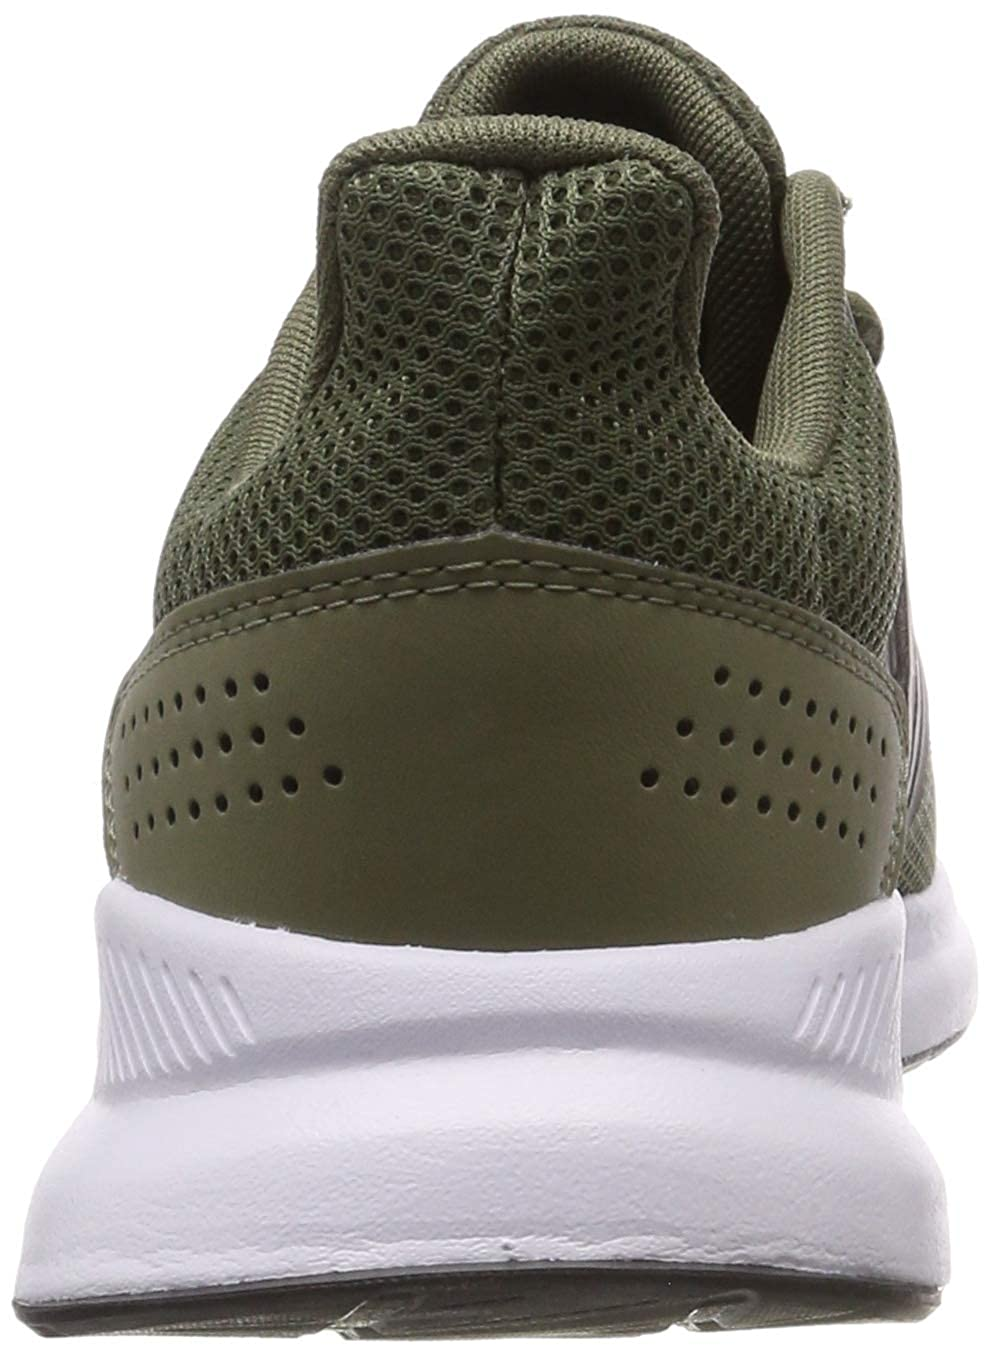 Zapatillas de Running para Hombre adidas Runfalcon